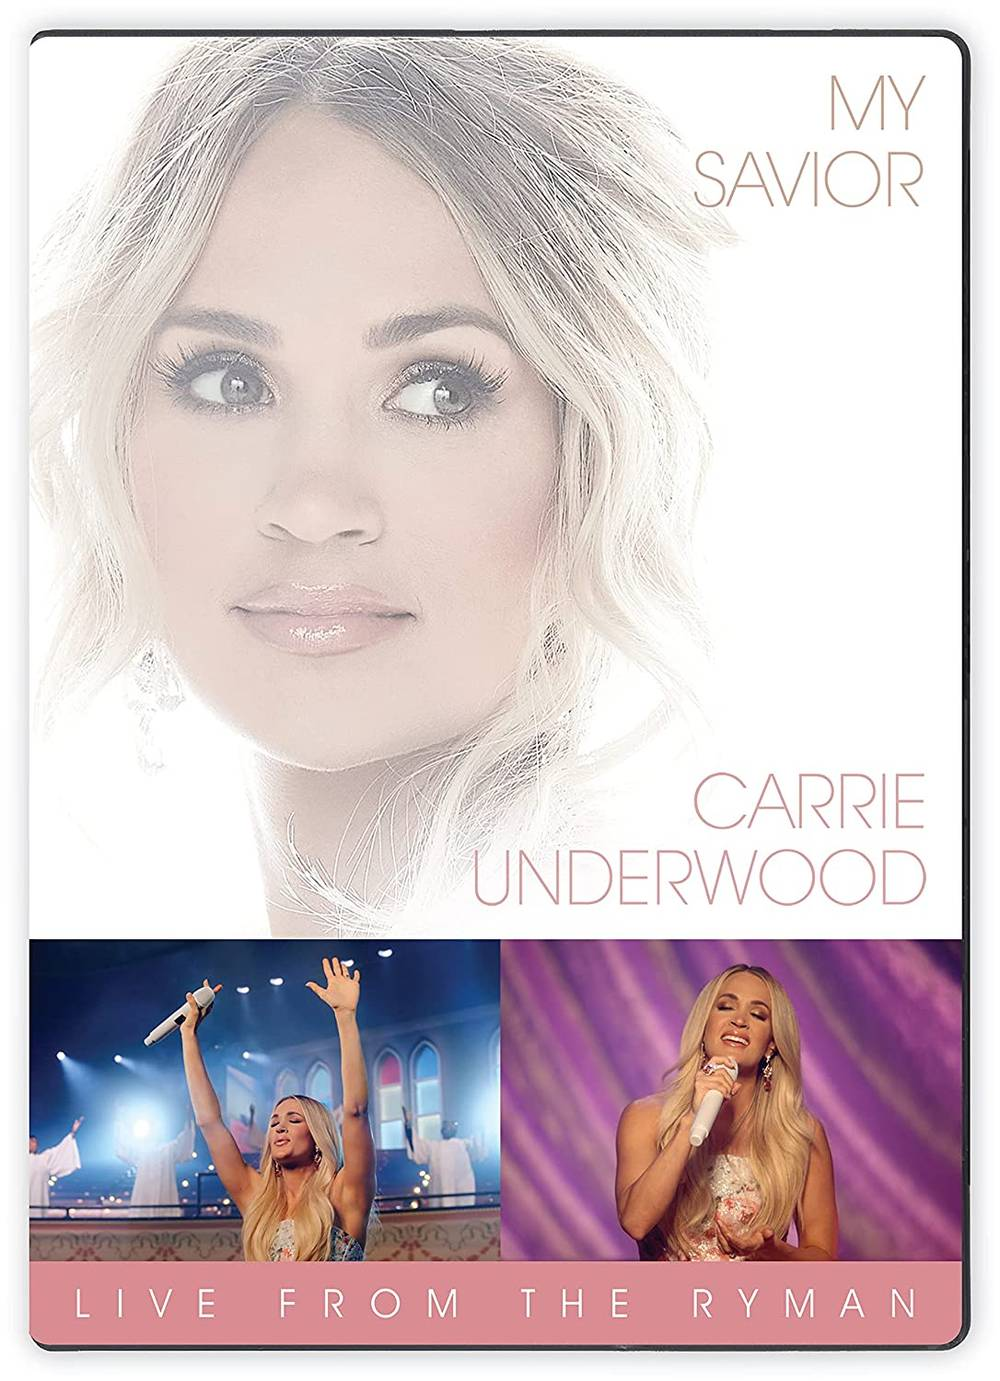 Carrie Underwood - My Savior: Live From The Ryman [DVD]